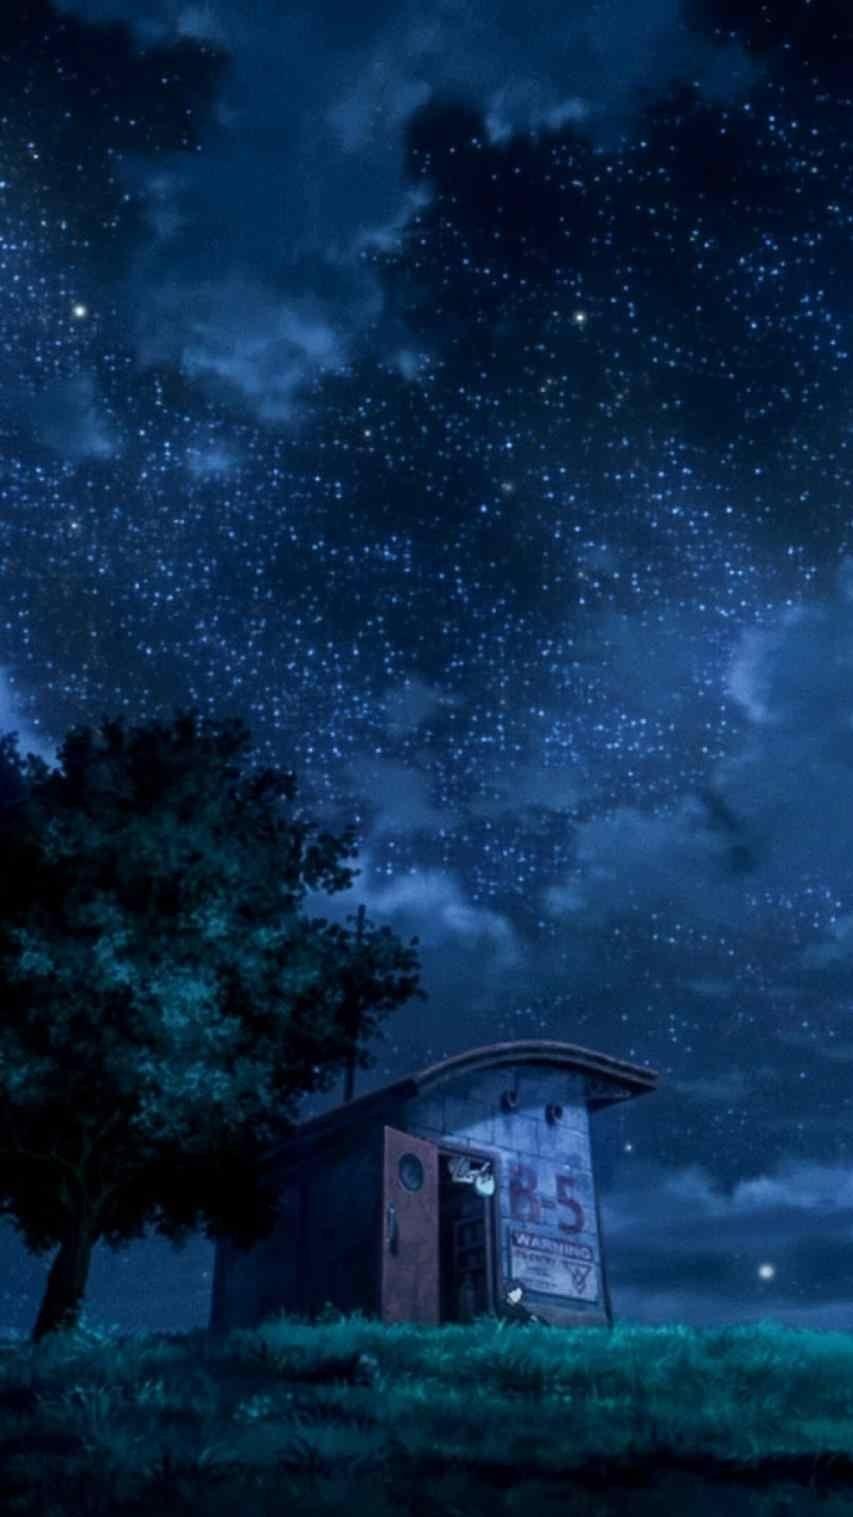 Dark Anime Phone Wallpapers Top Free Dark Anime Phone